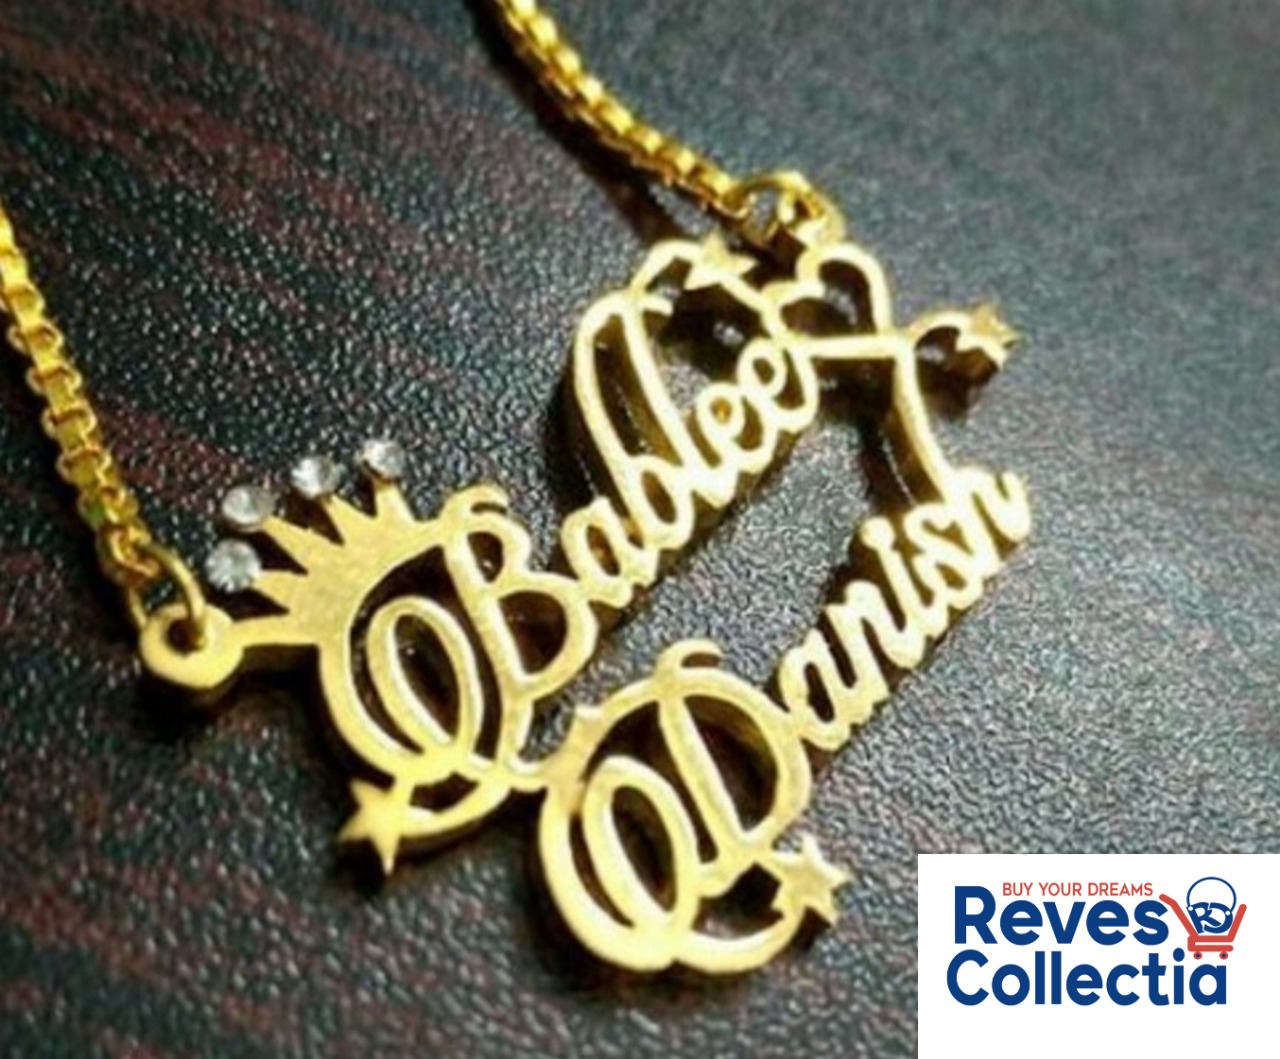 Customized name 18K gold plated name locket, Personalized Name Locket,18k Gold plated Jewelry Necklace